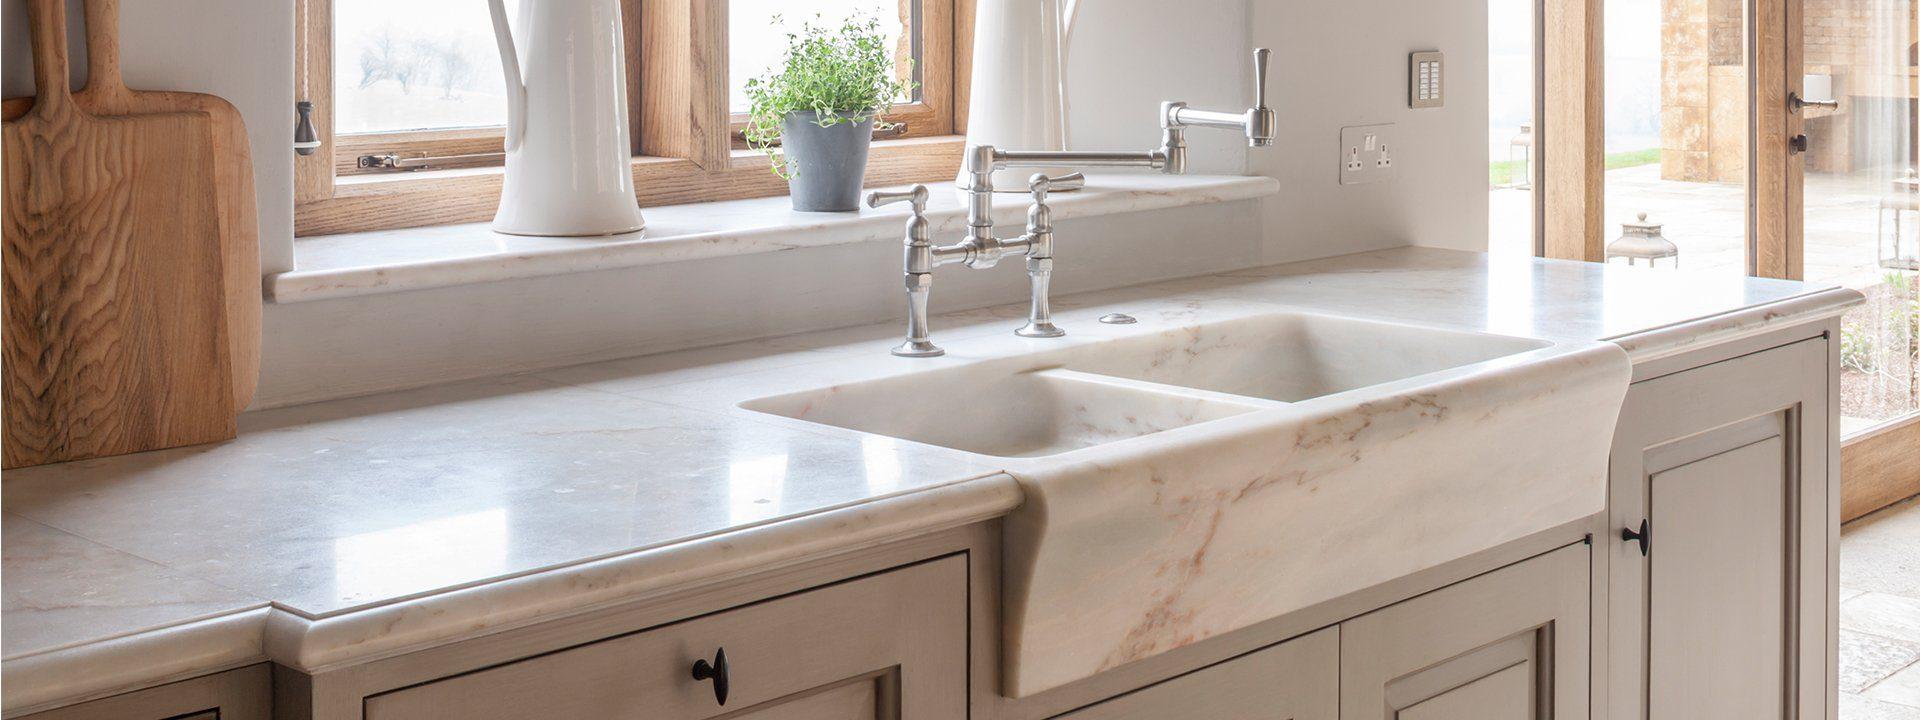 artichoke kitchens marble counter sink